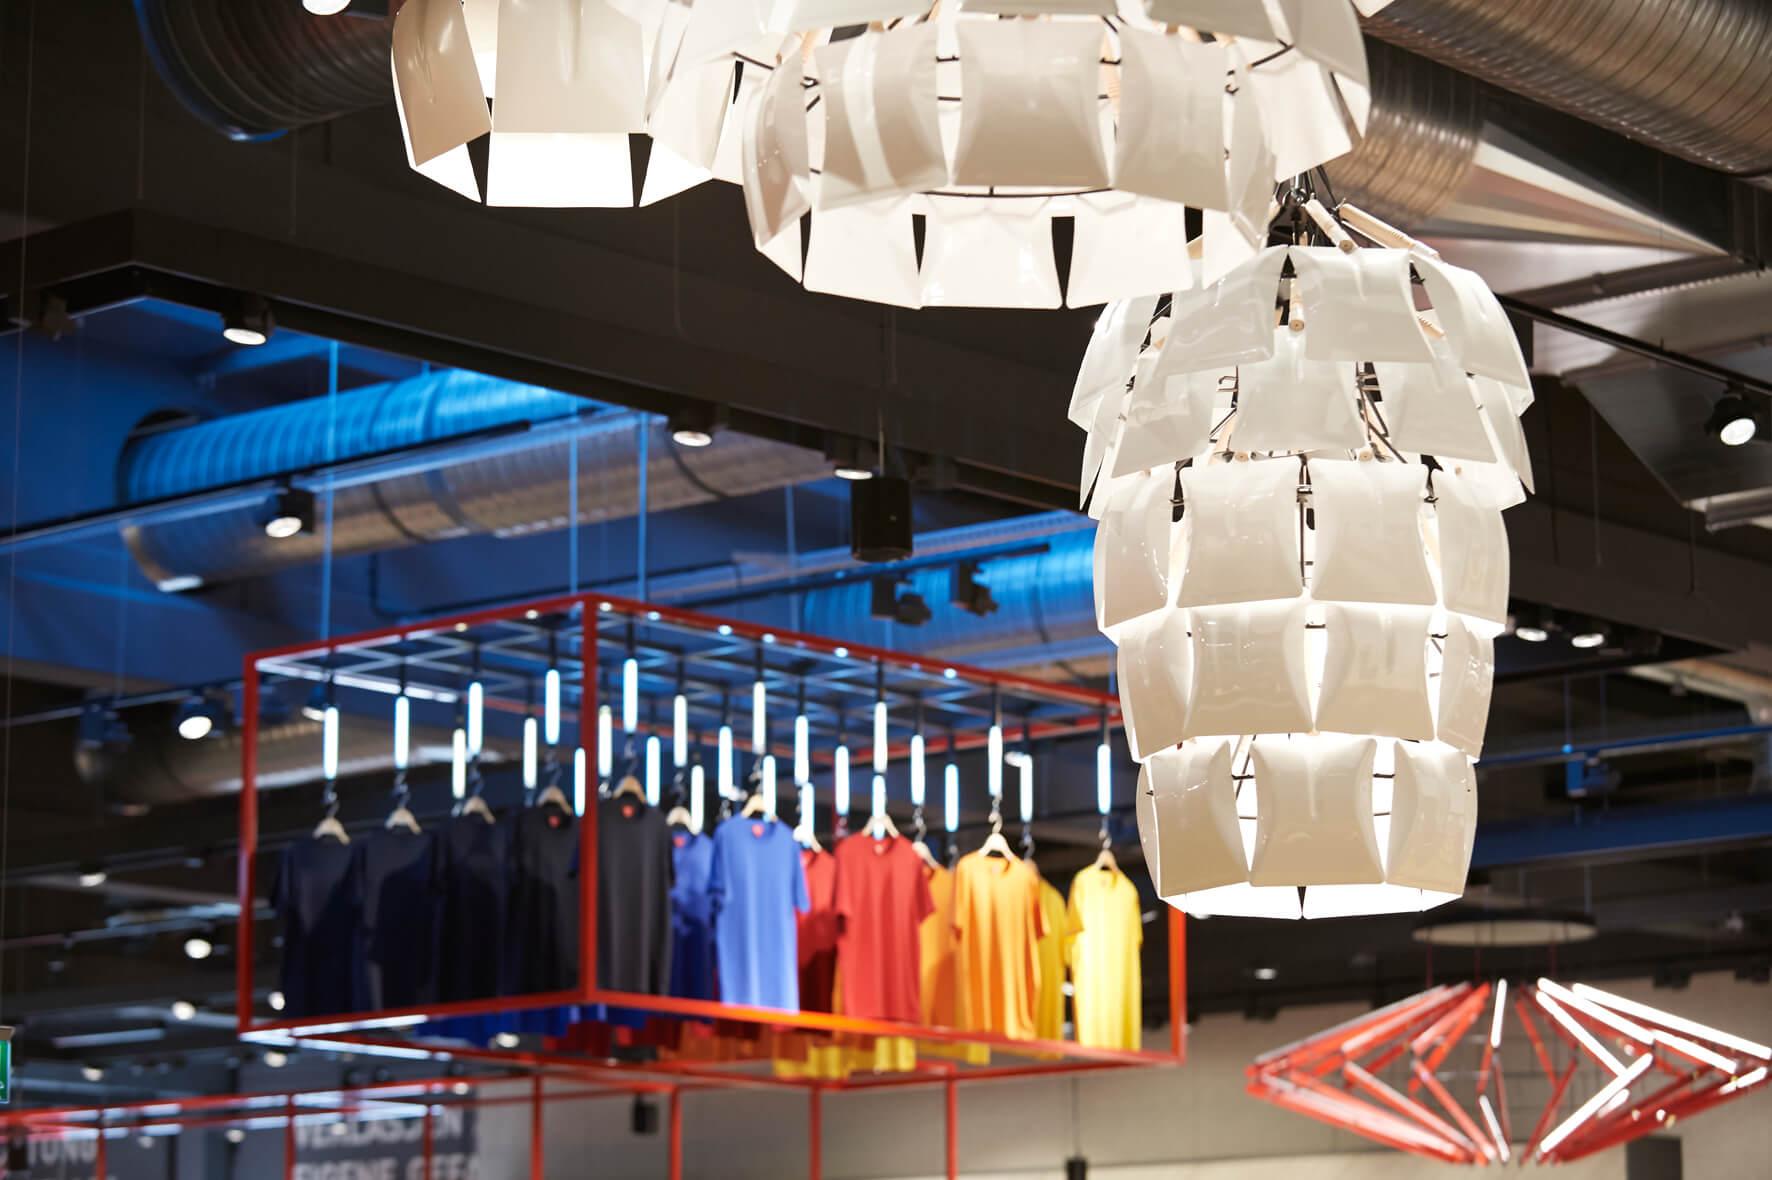 eroeffnung workwearstore oberhausen detail brand growth inspiration. Black Bedroom Furniture Sets. Home Design Ideas